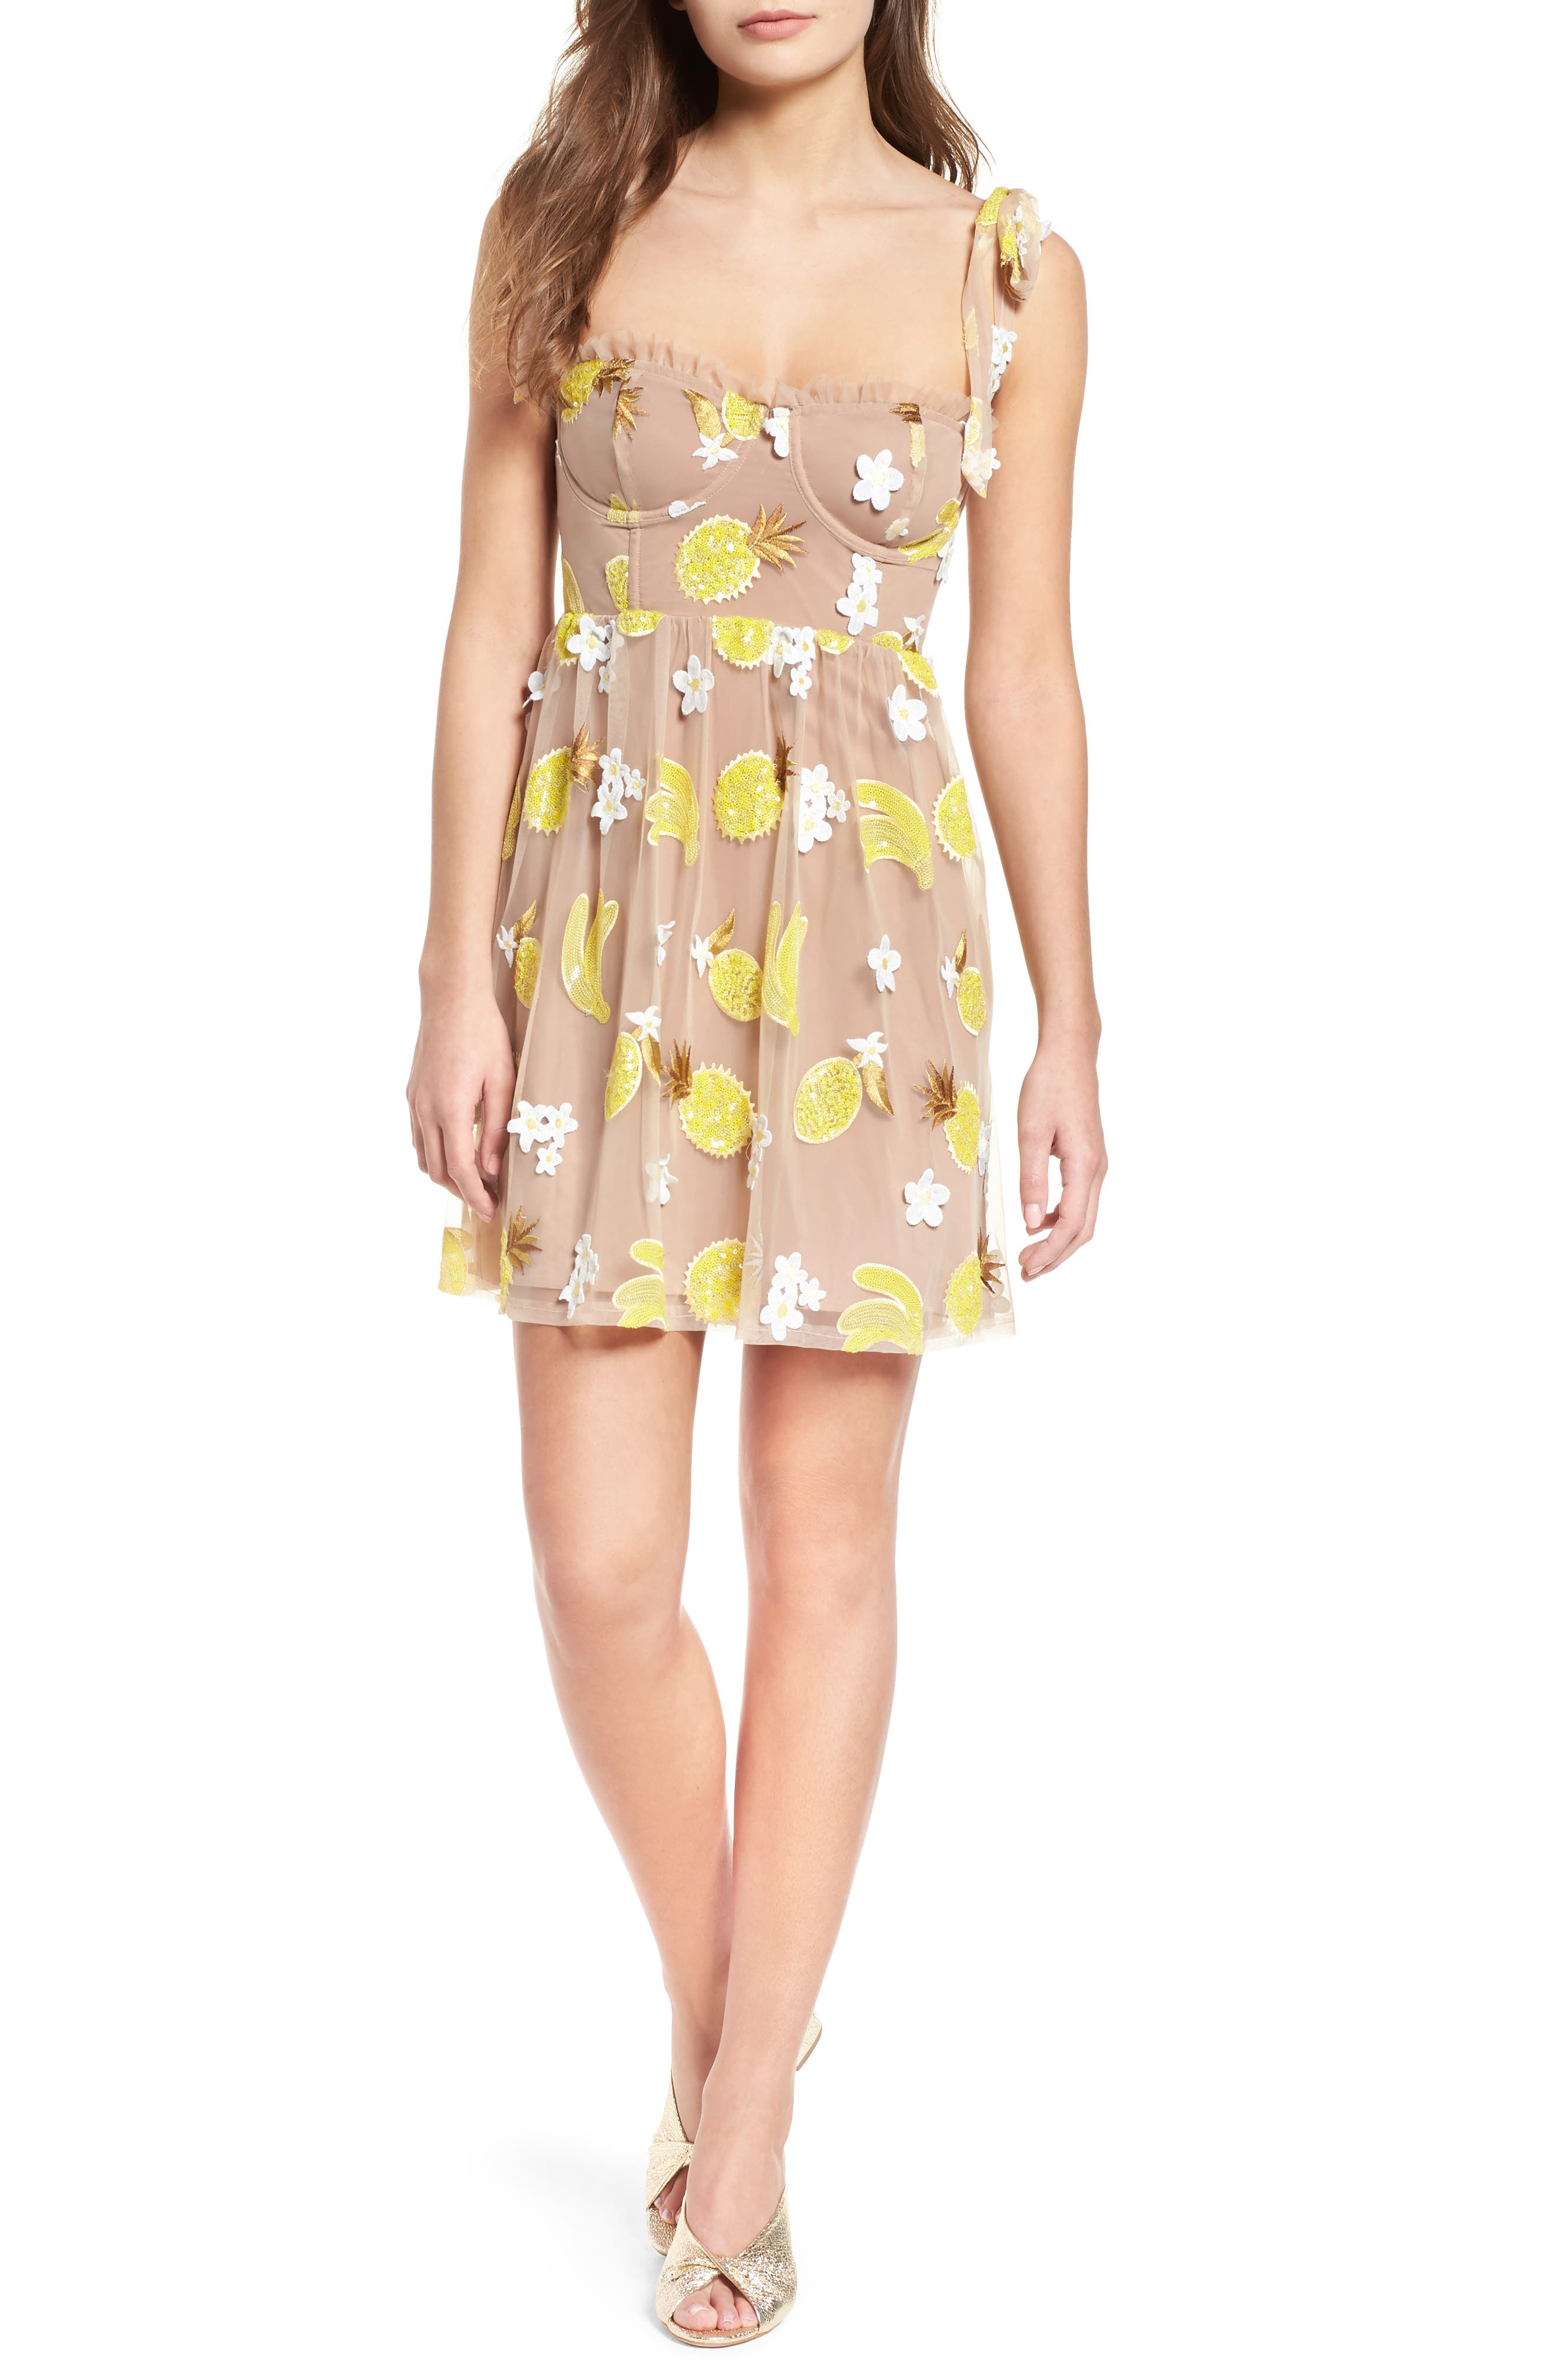 Fruitpunch Sequin Minidress,                             Main thumbnail 1, color,                             Pineapple